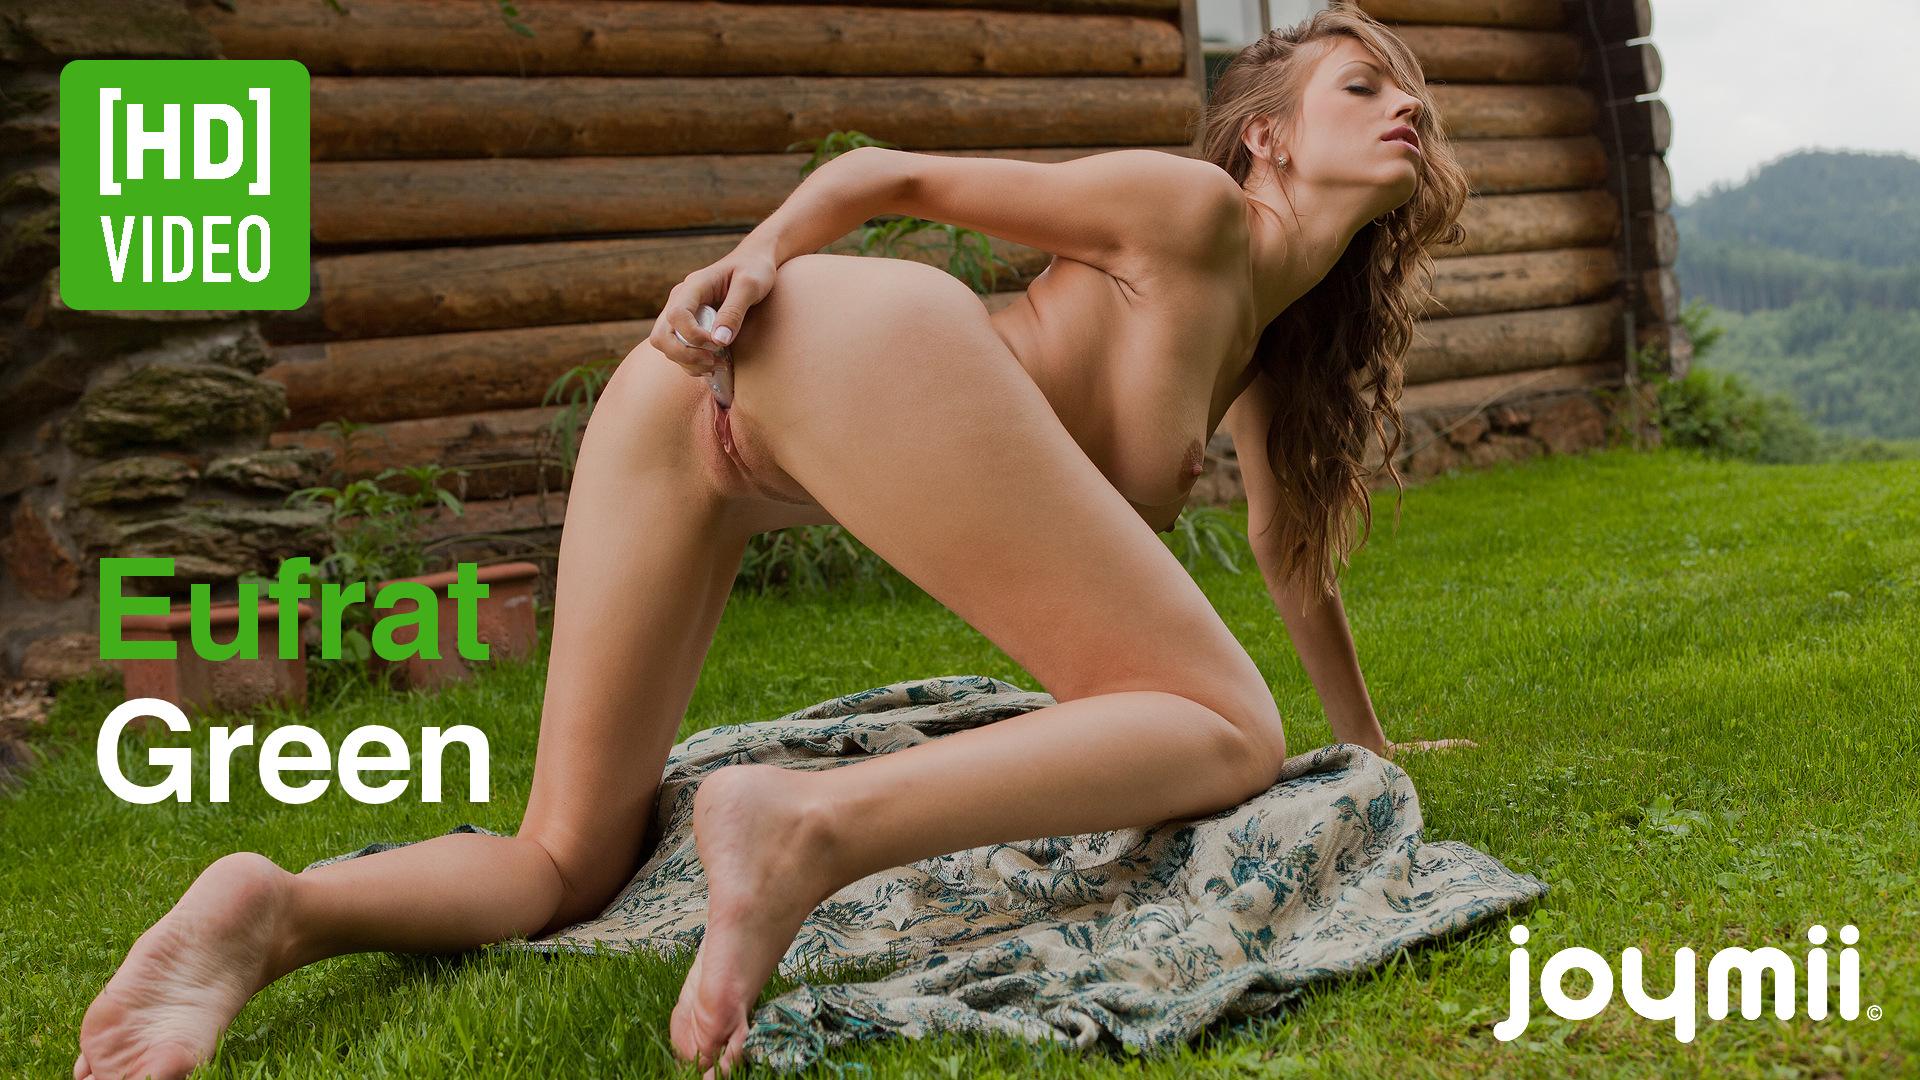 Www.bigpornbb.org - Free Porn Video Forum ::: - View Single Post - RapidGat